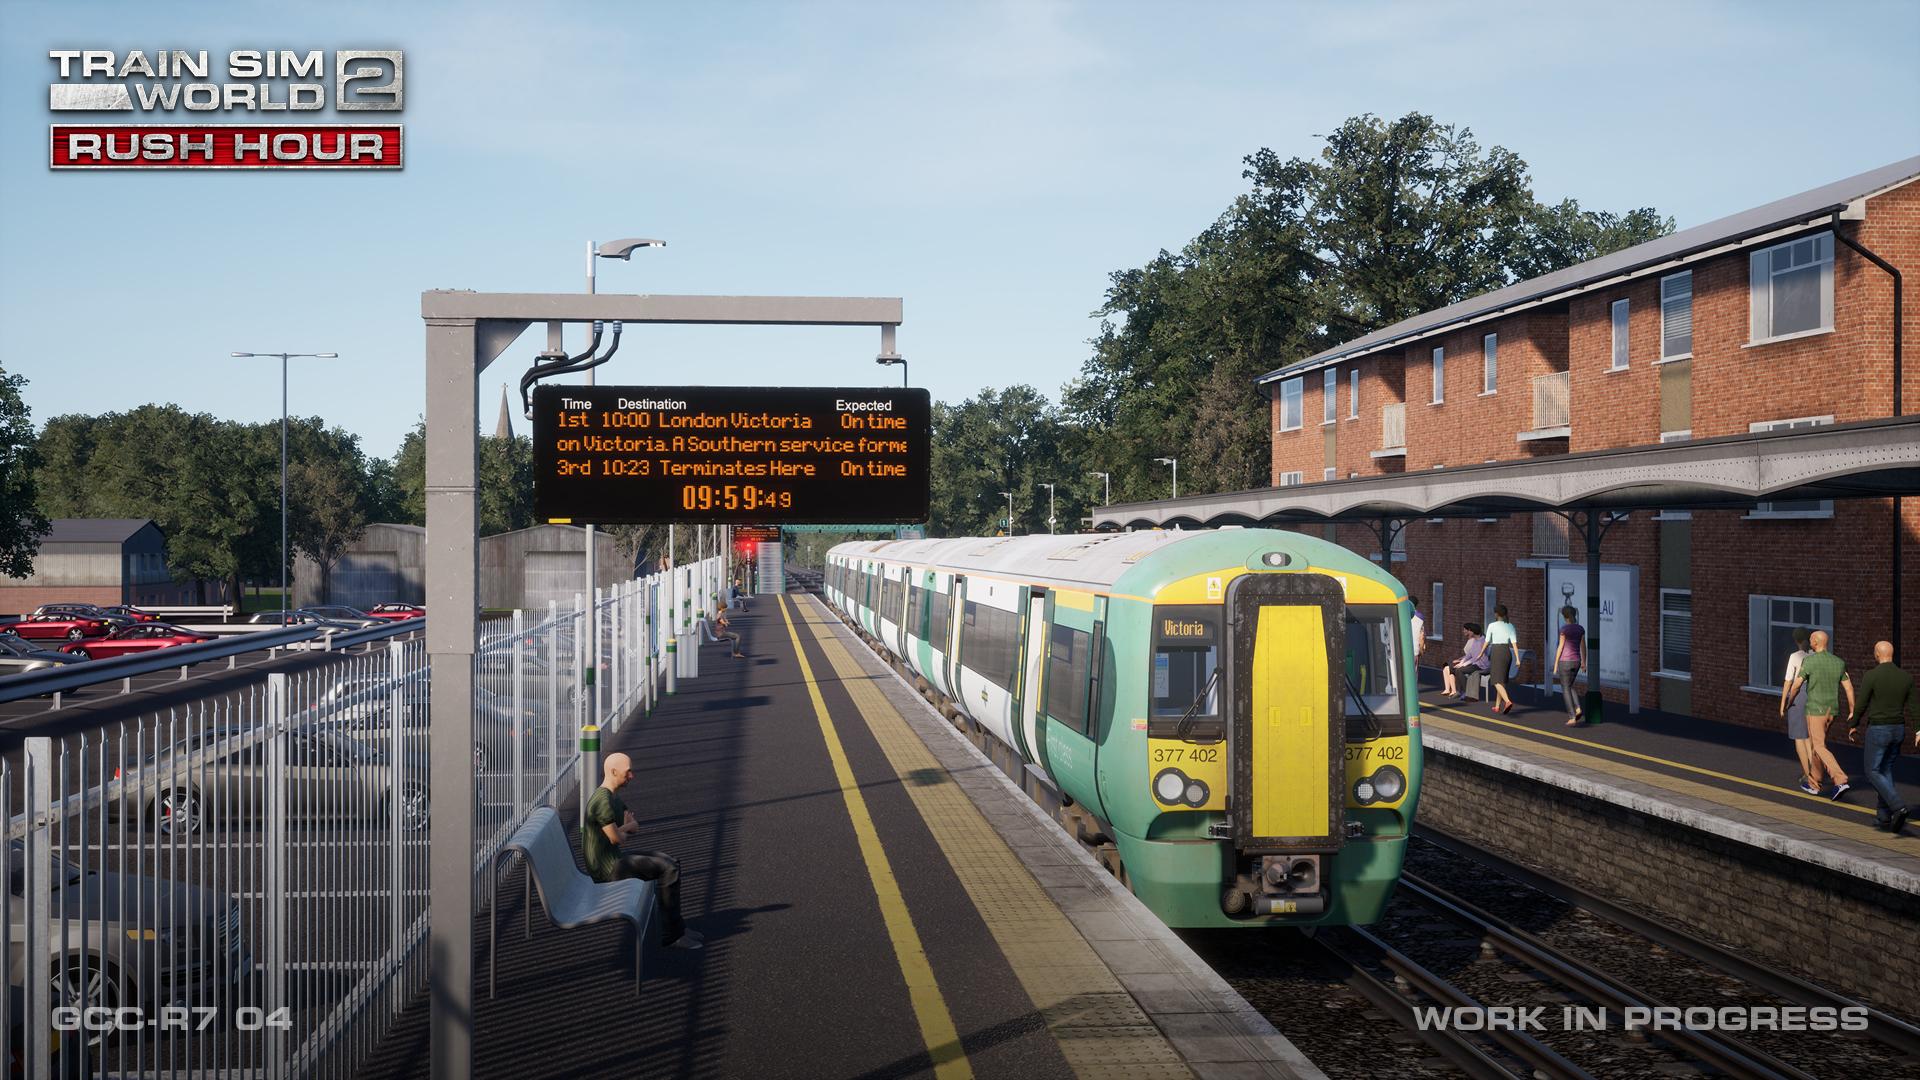 TSW2_RushHour_LondonCommuter_firstscreens2.jpg